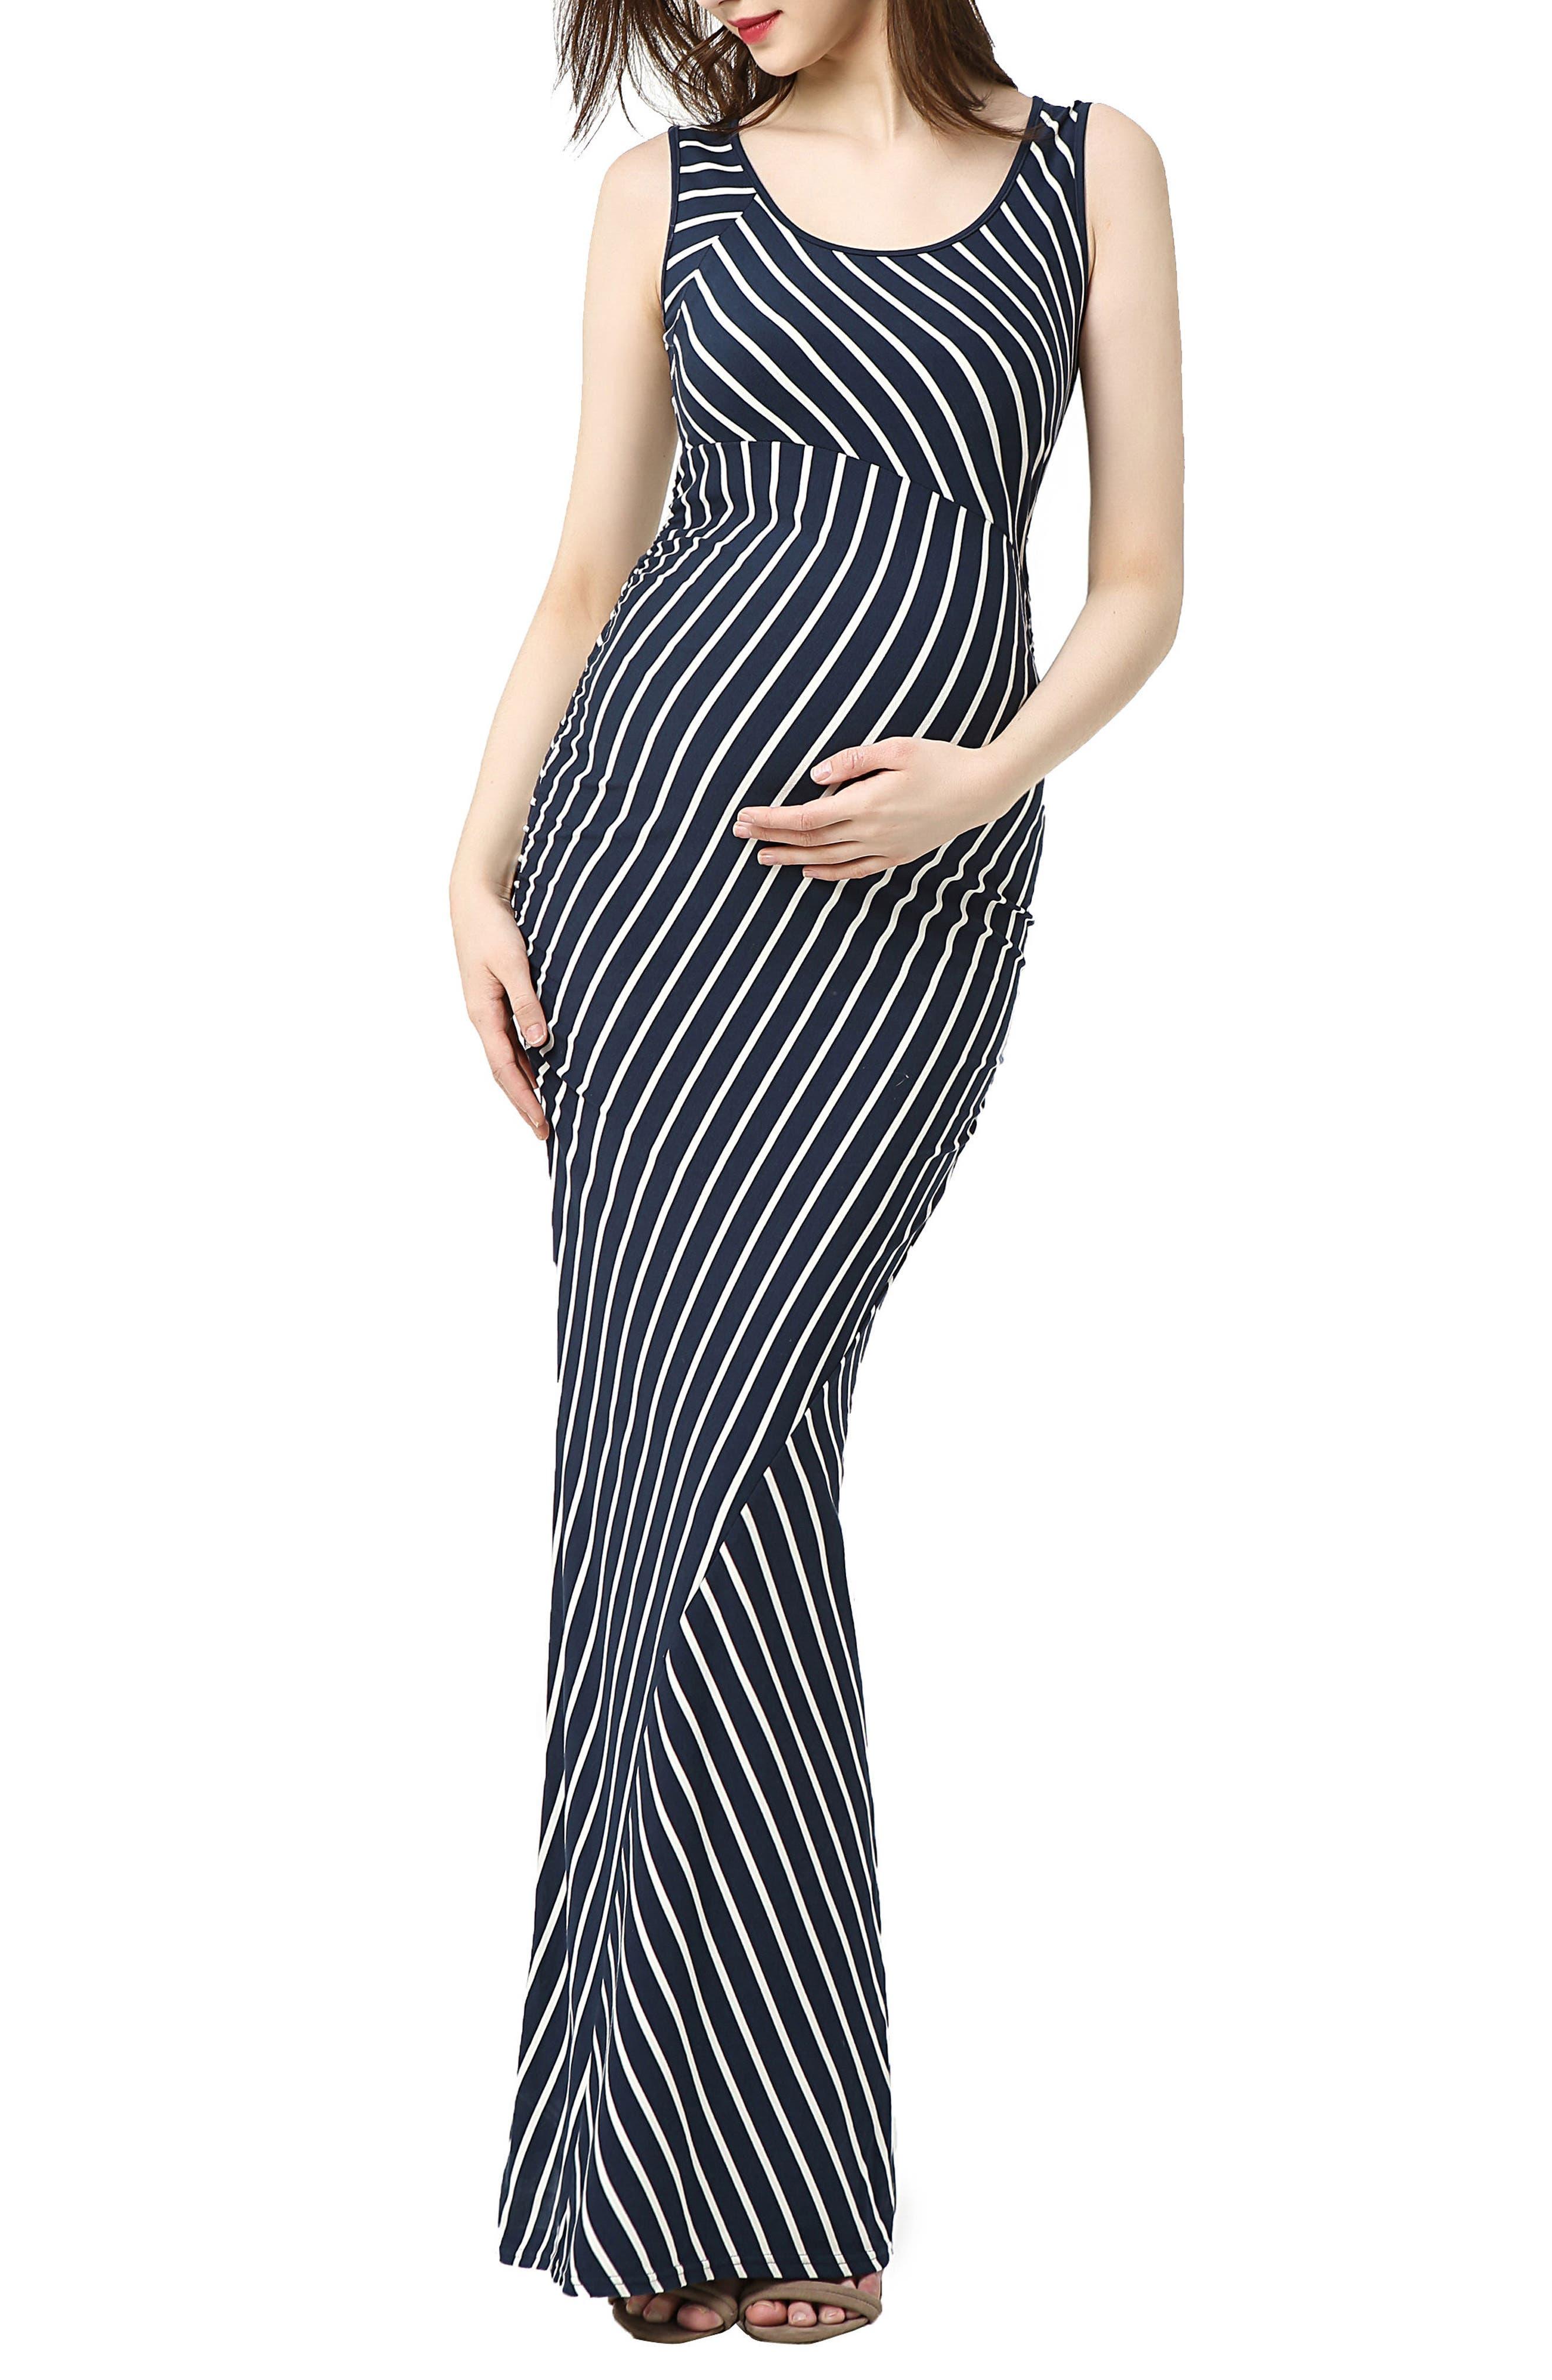 Peyton Stripe Maxi Maternity Dress,                             Main thumbnail 1, color,                             NAVY/ IVORY